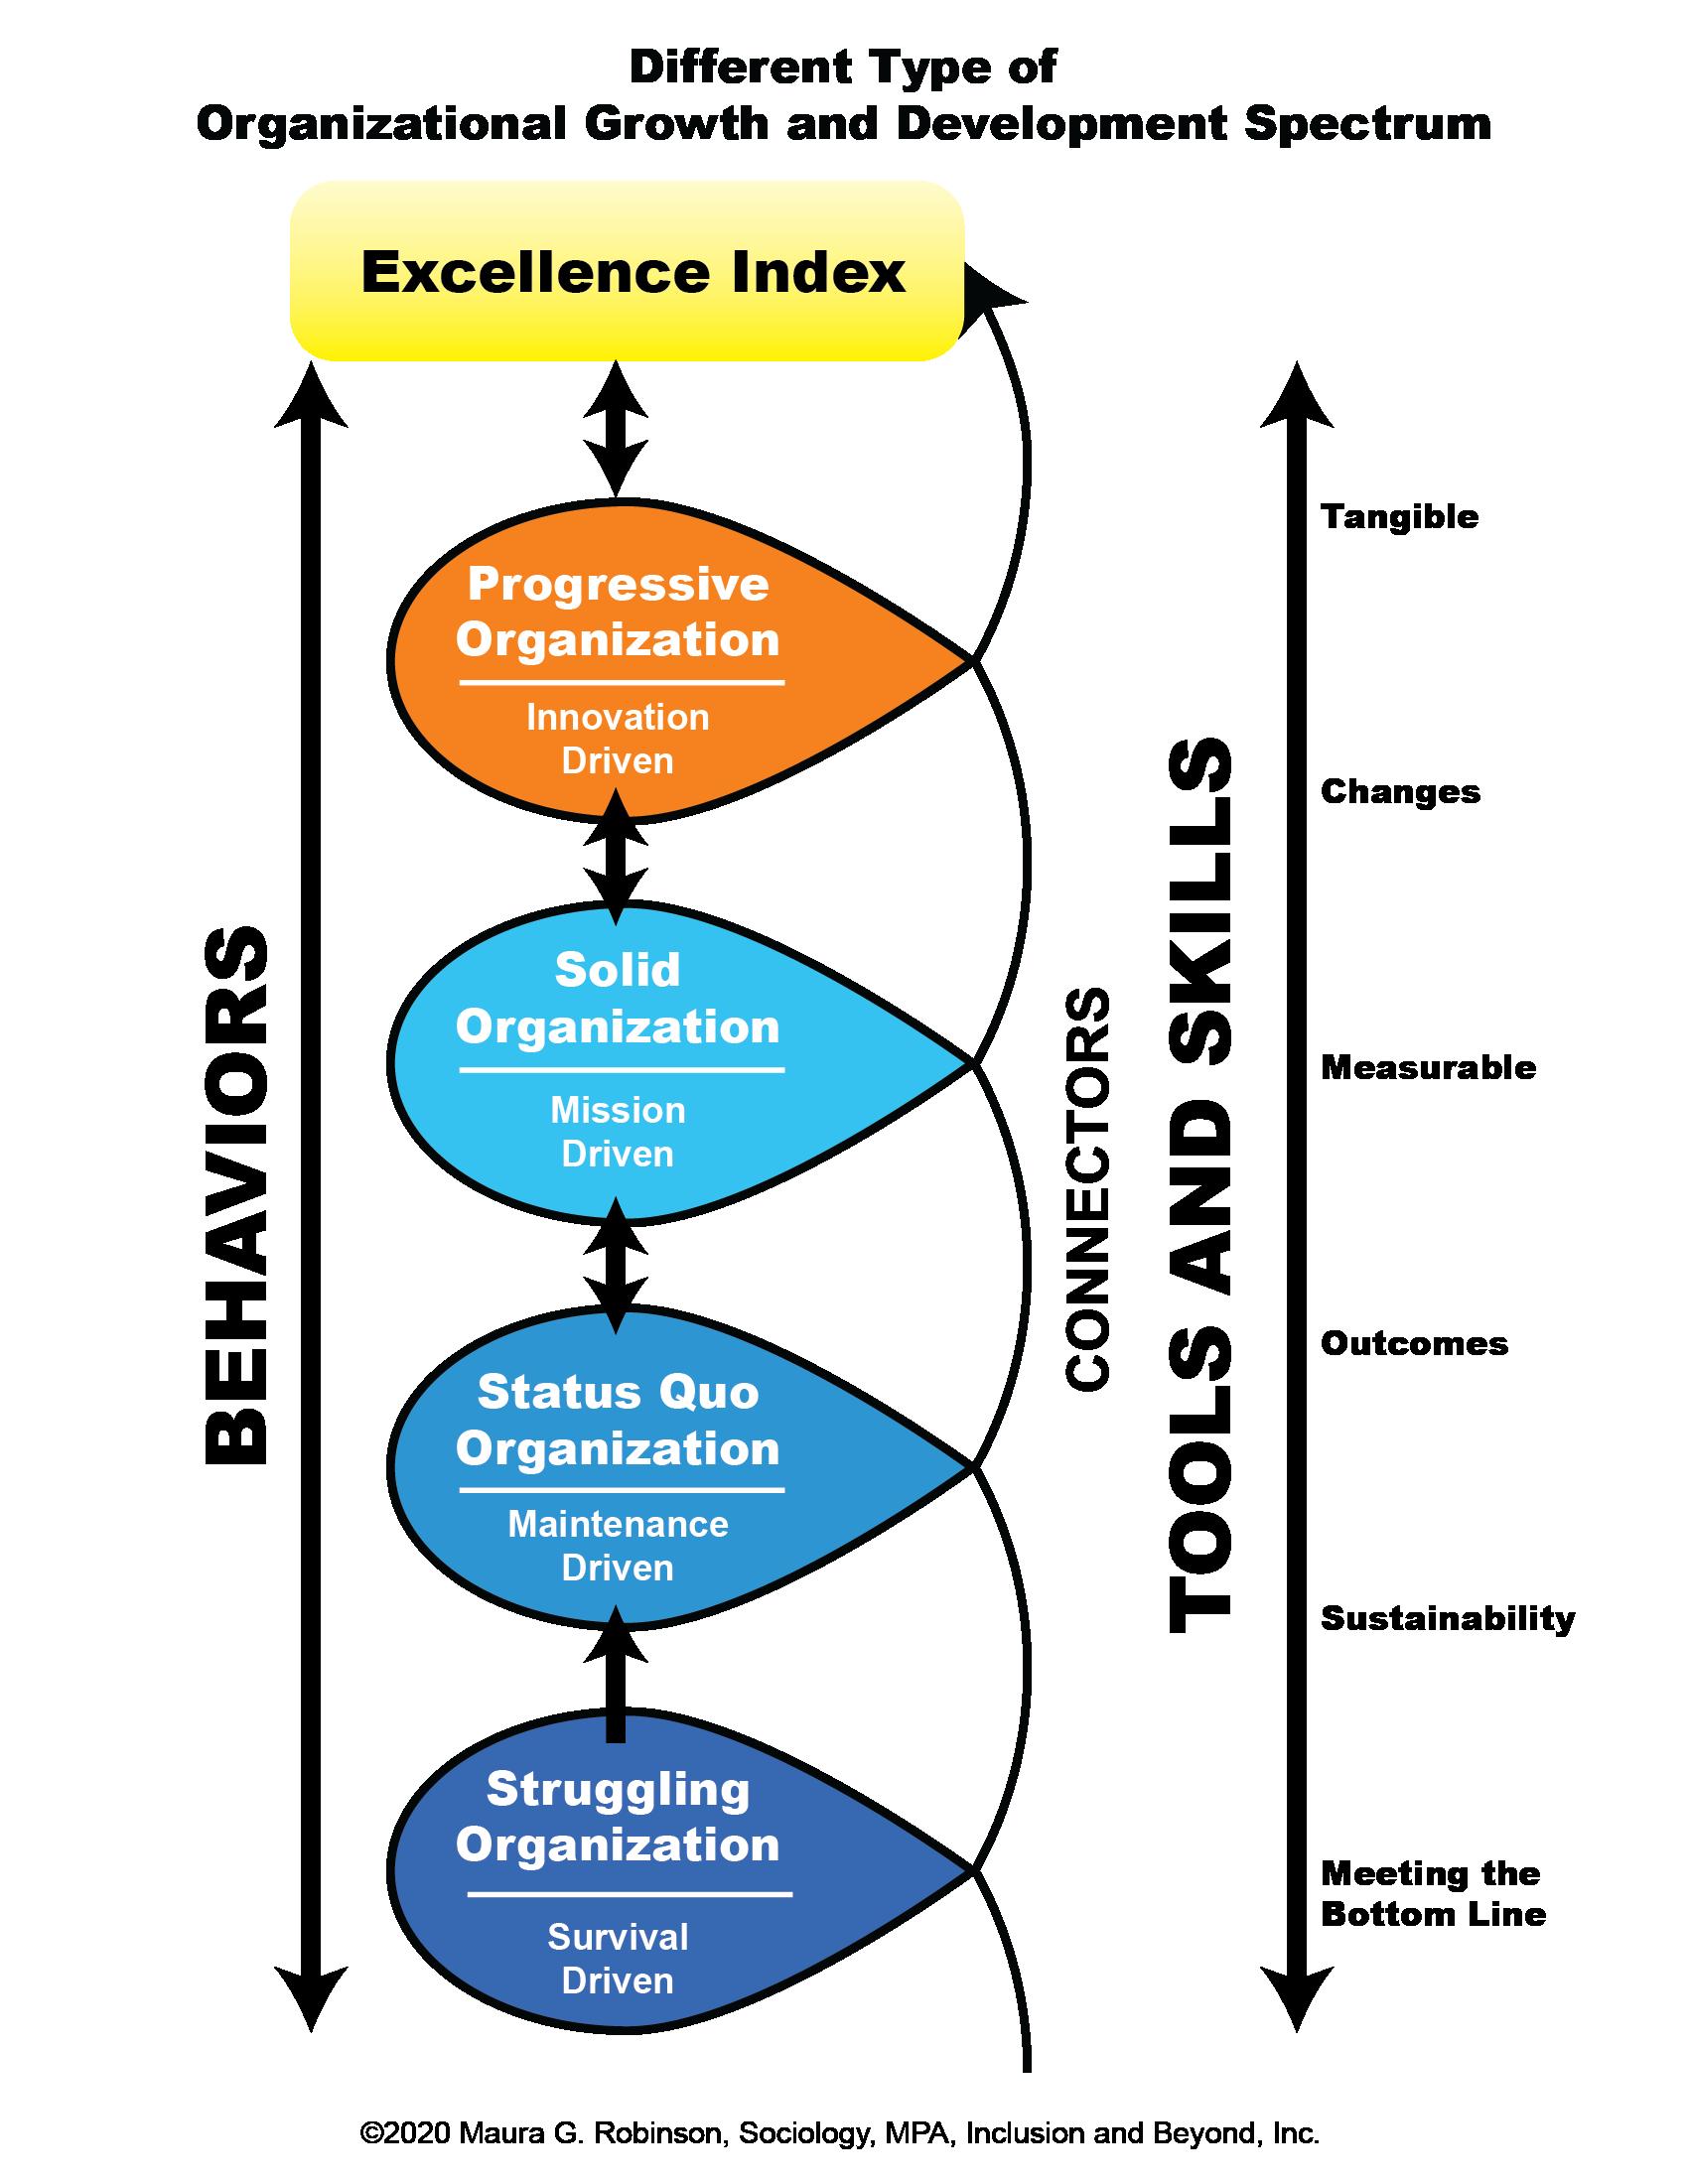 lean six sigma certification - organizational growth